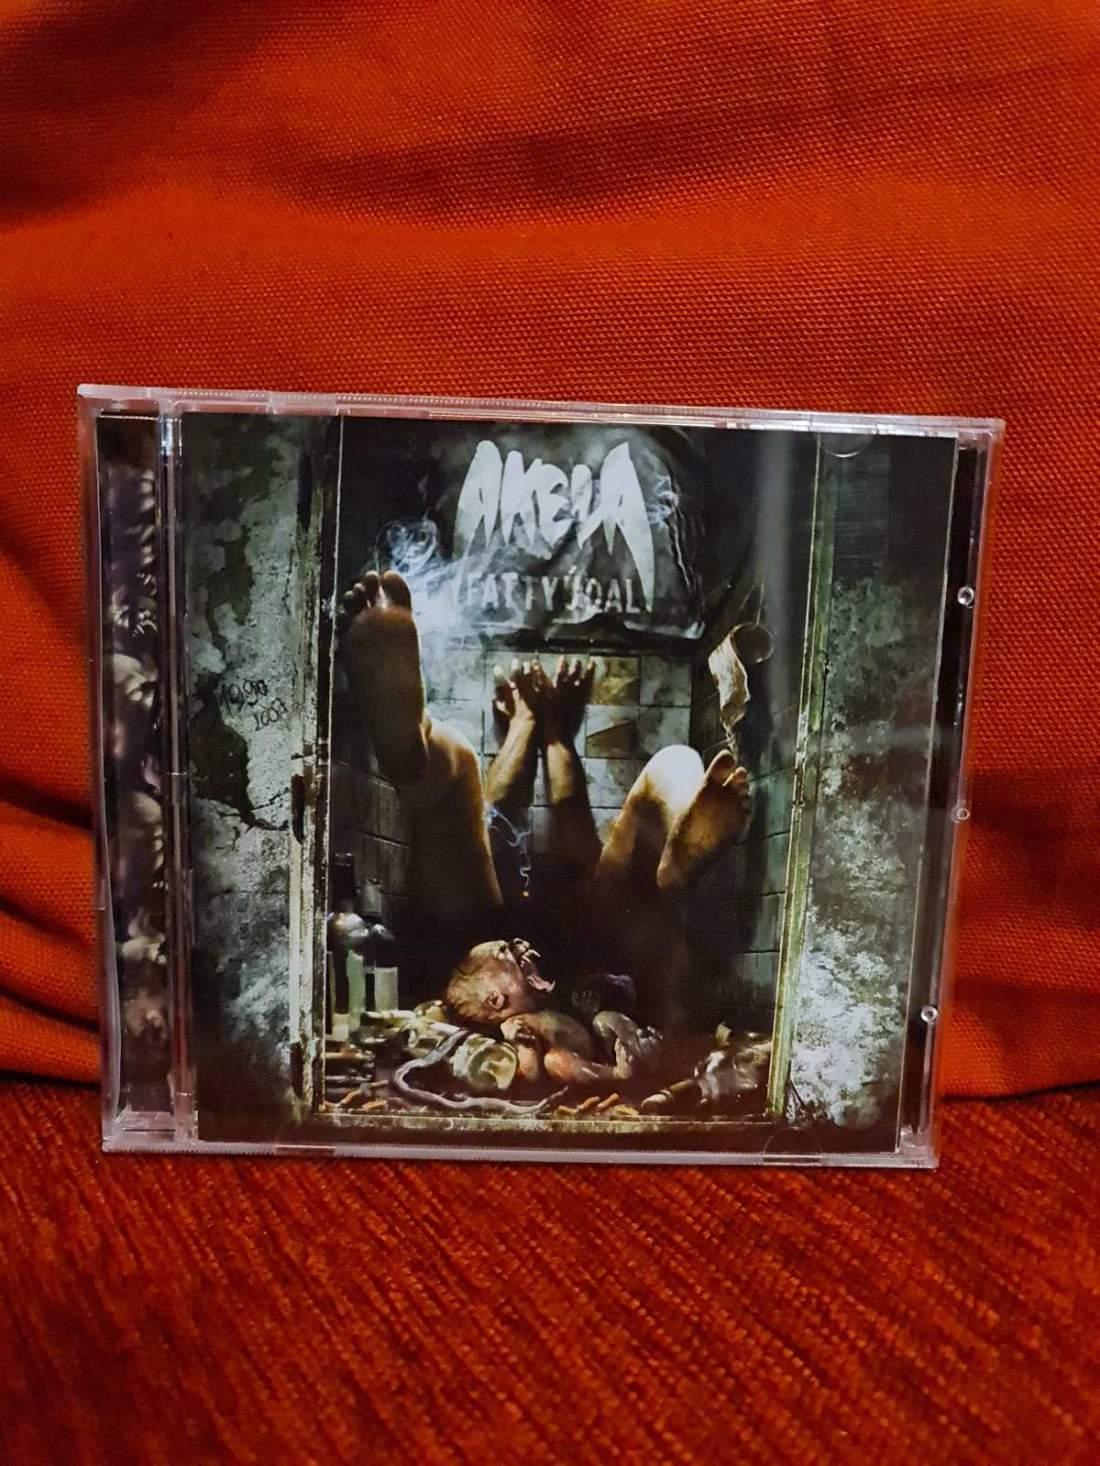 AKELA - FATTYÚDAL CD